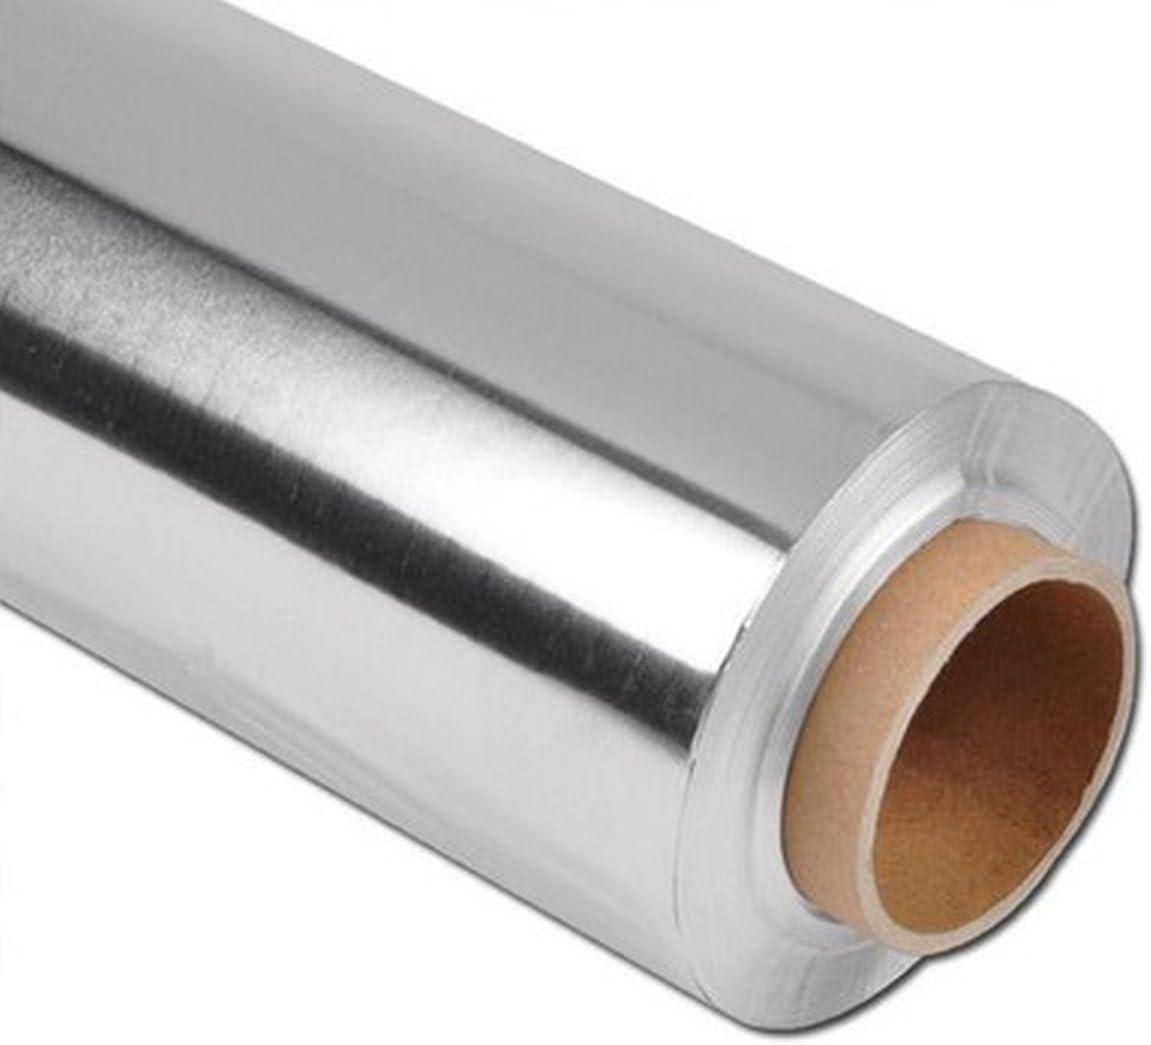 Feuille daluminium 1/kg Super Stark Papier aluminium Alu Rouleau Auto-Bijoux/® 29/cm x 150/m 35/microns Silber